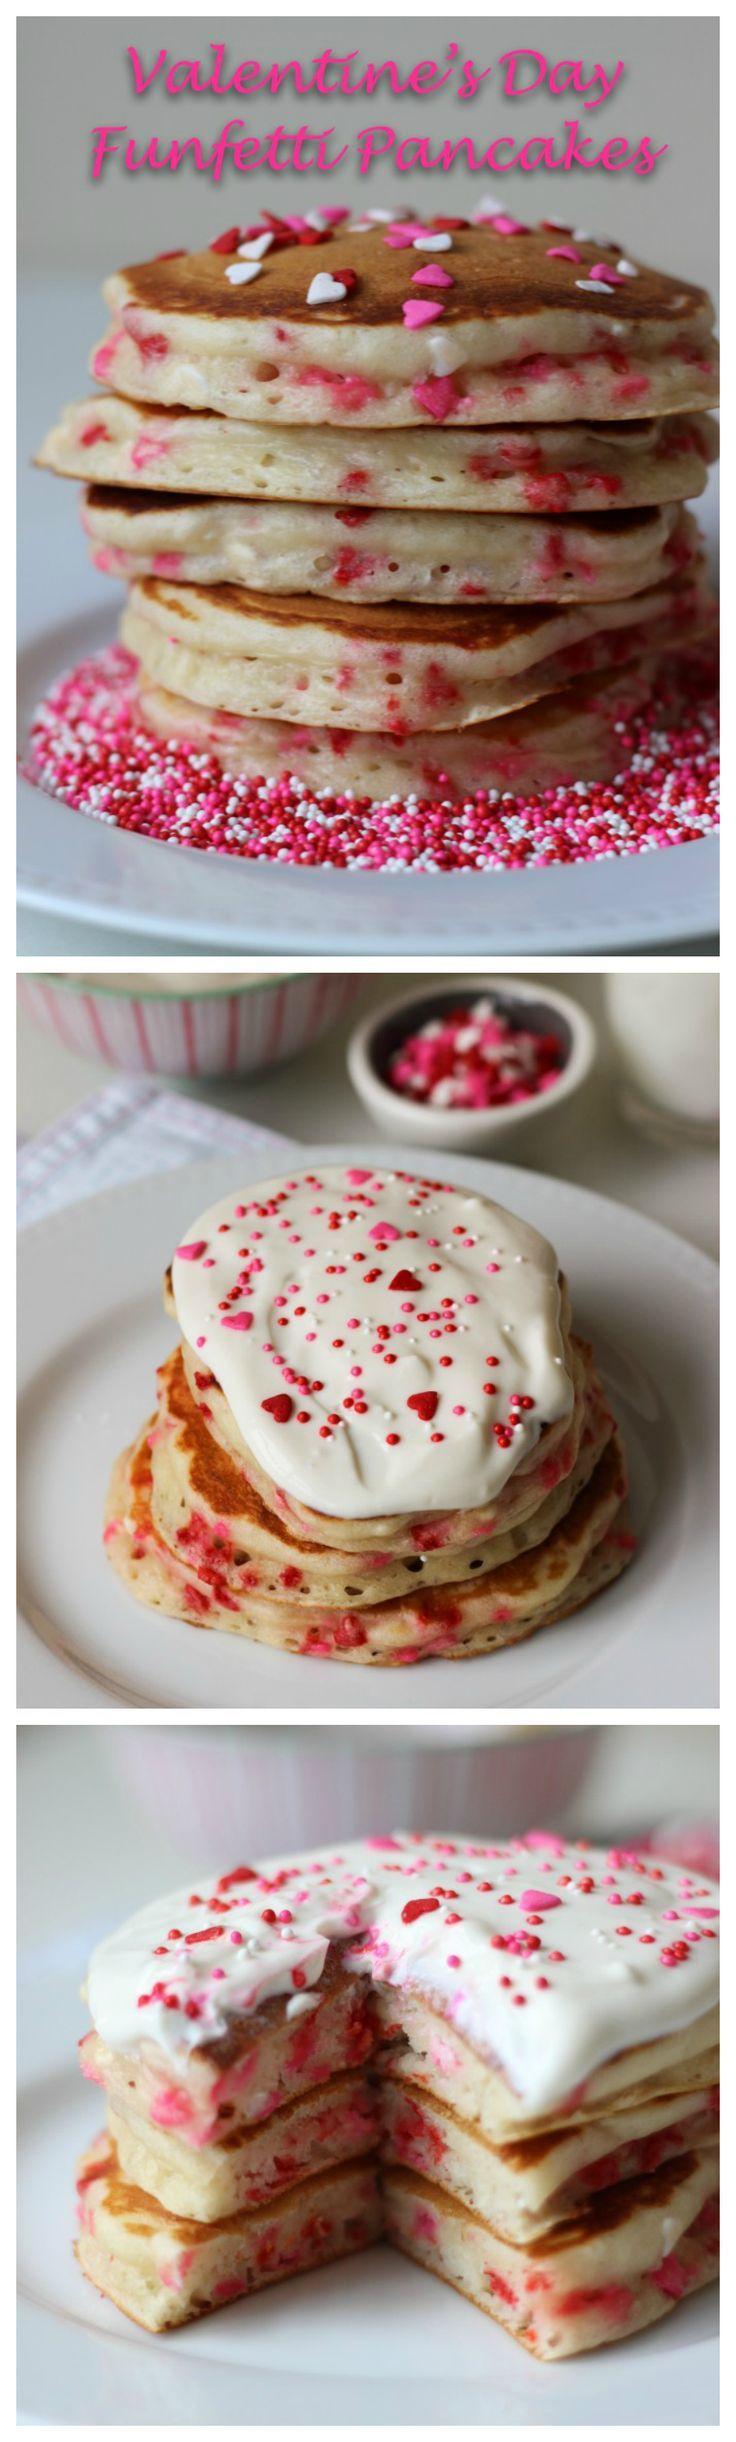 Valentine's Day Funfetti Pancakes with Vanilla Greek Yogurt Sauce   ChezCateyLou.com